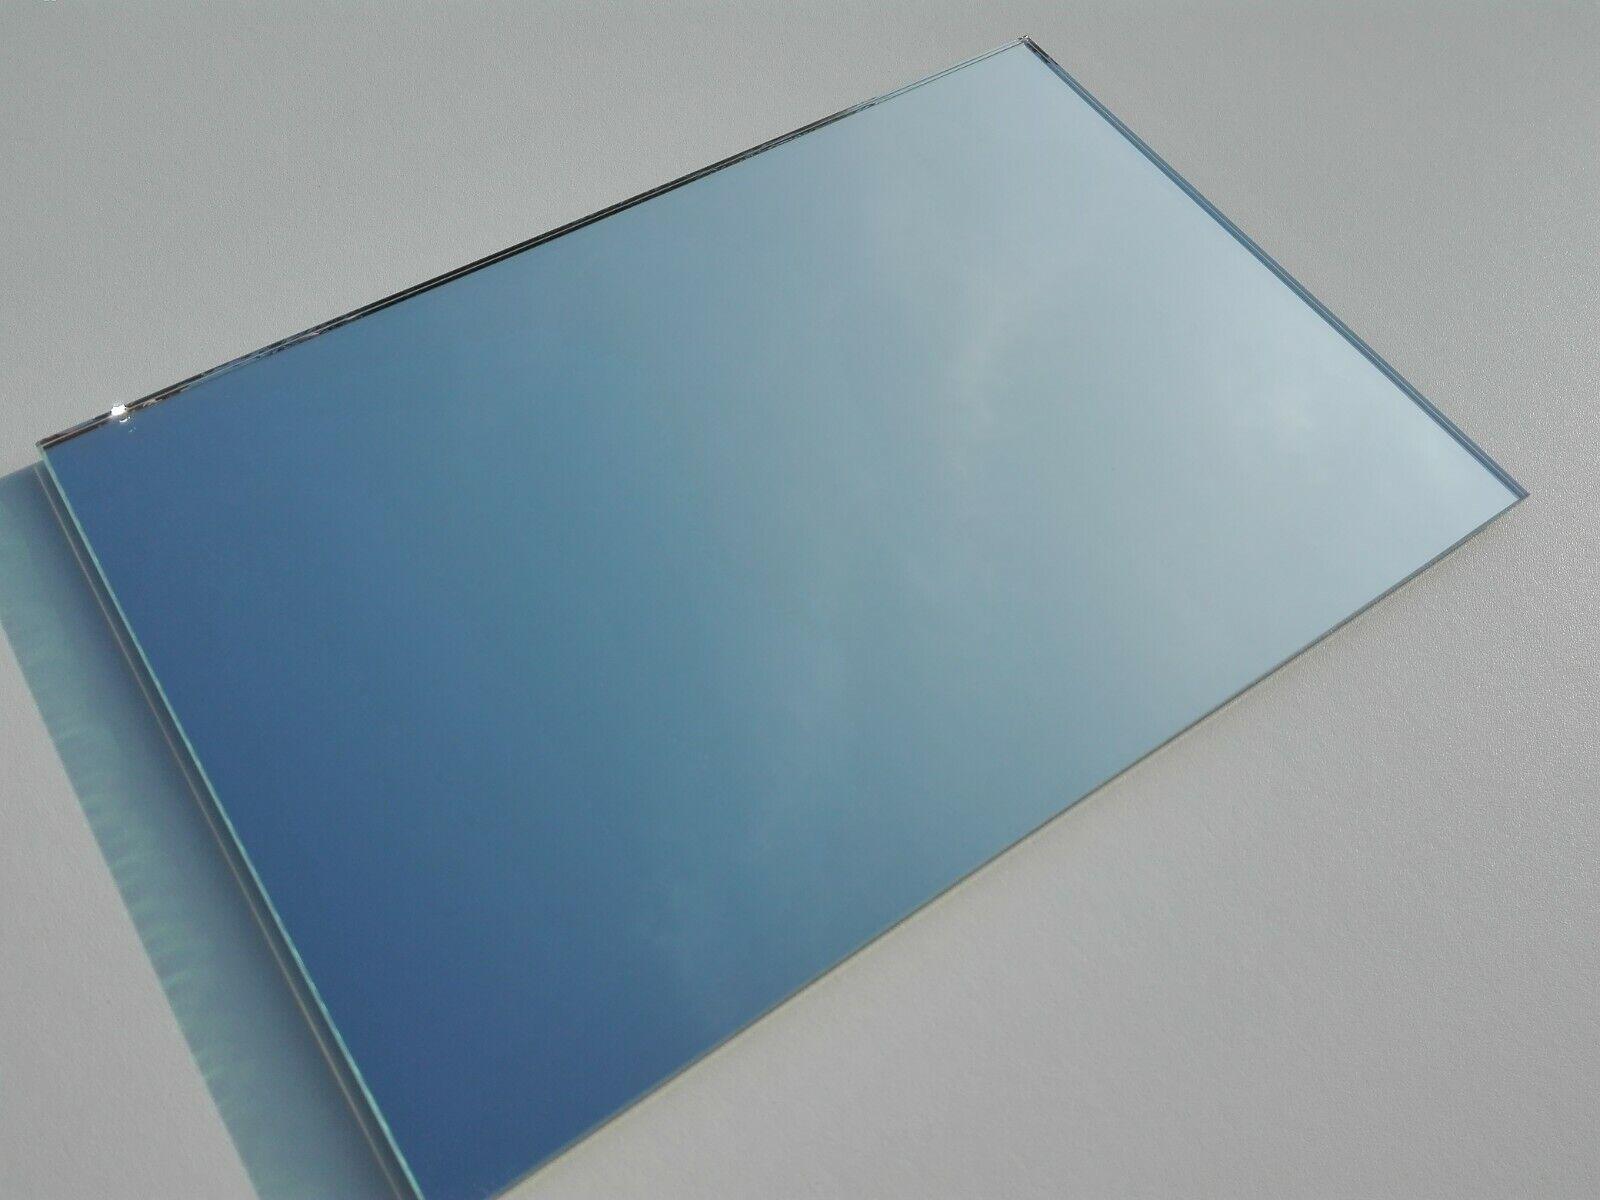 Spiegel auf Maß Zuschnitt Wandspiegel nach Maß 3+4+6mm Spiegelfliesen Wunschmaß